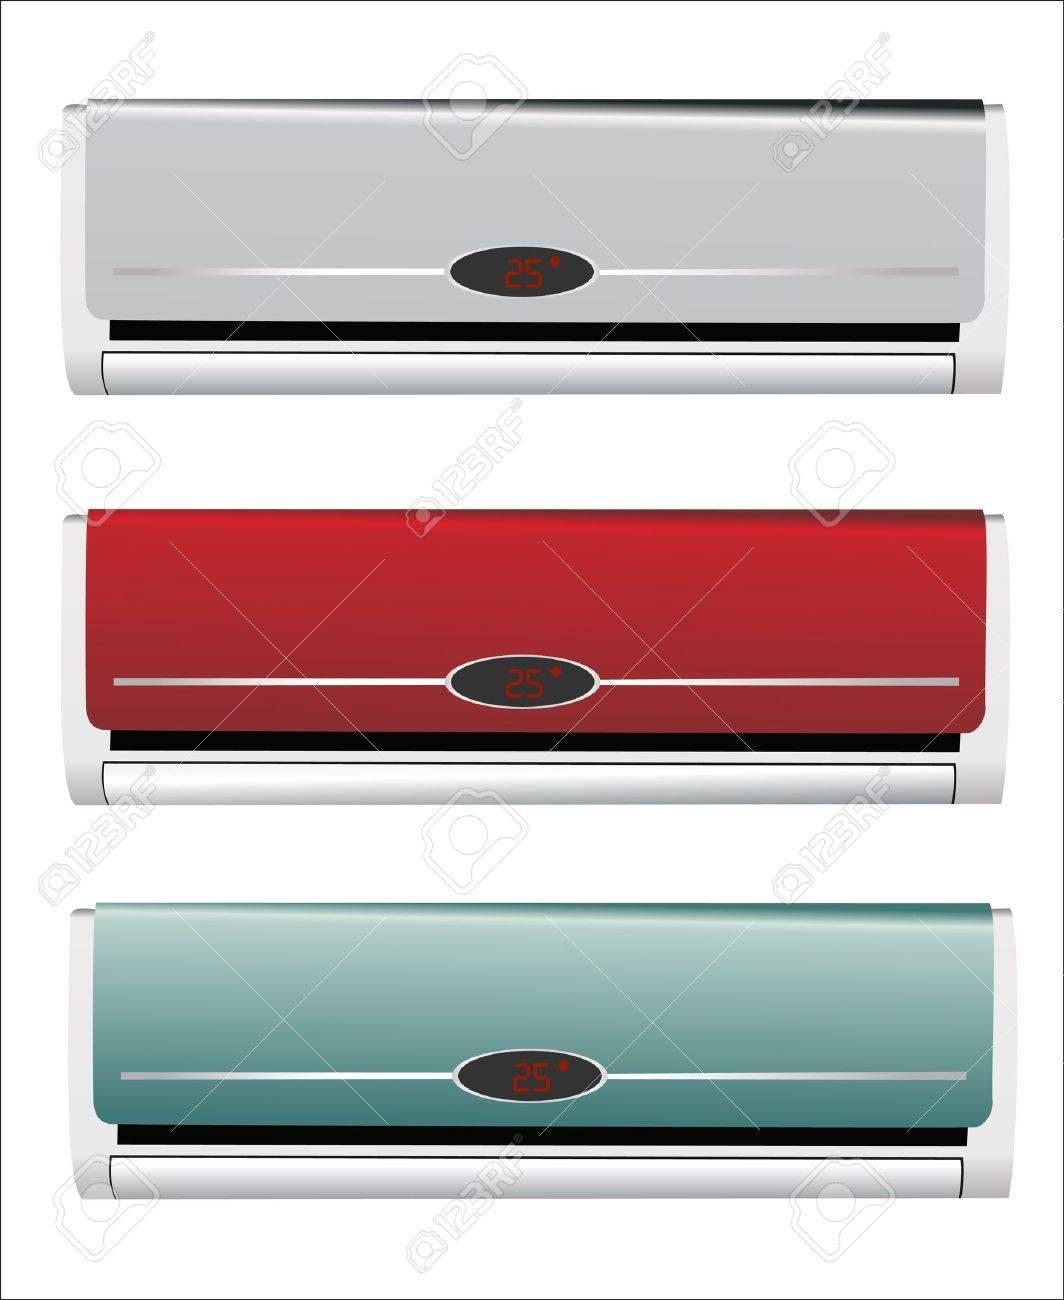 Air conditioner Stock Vector - 13928687